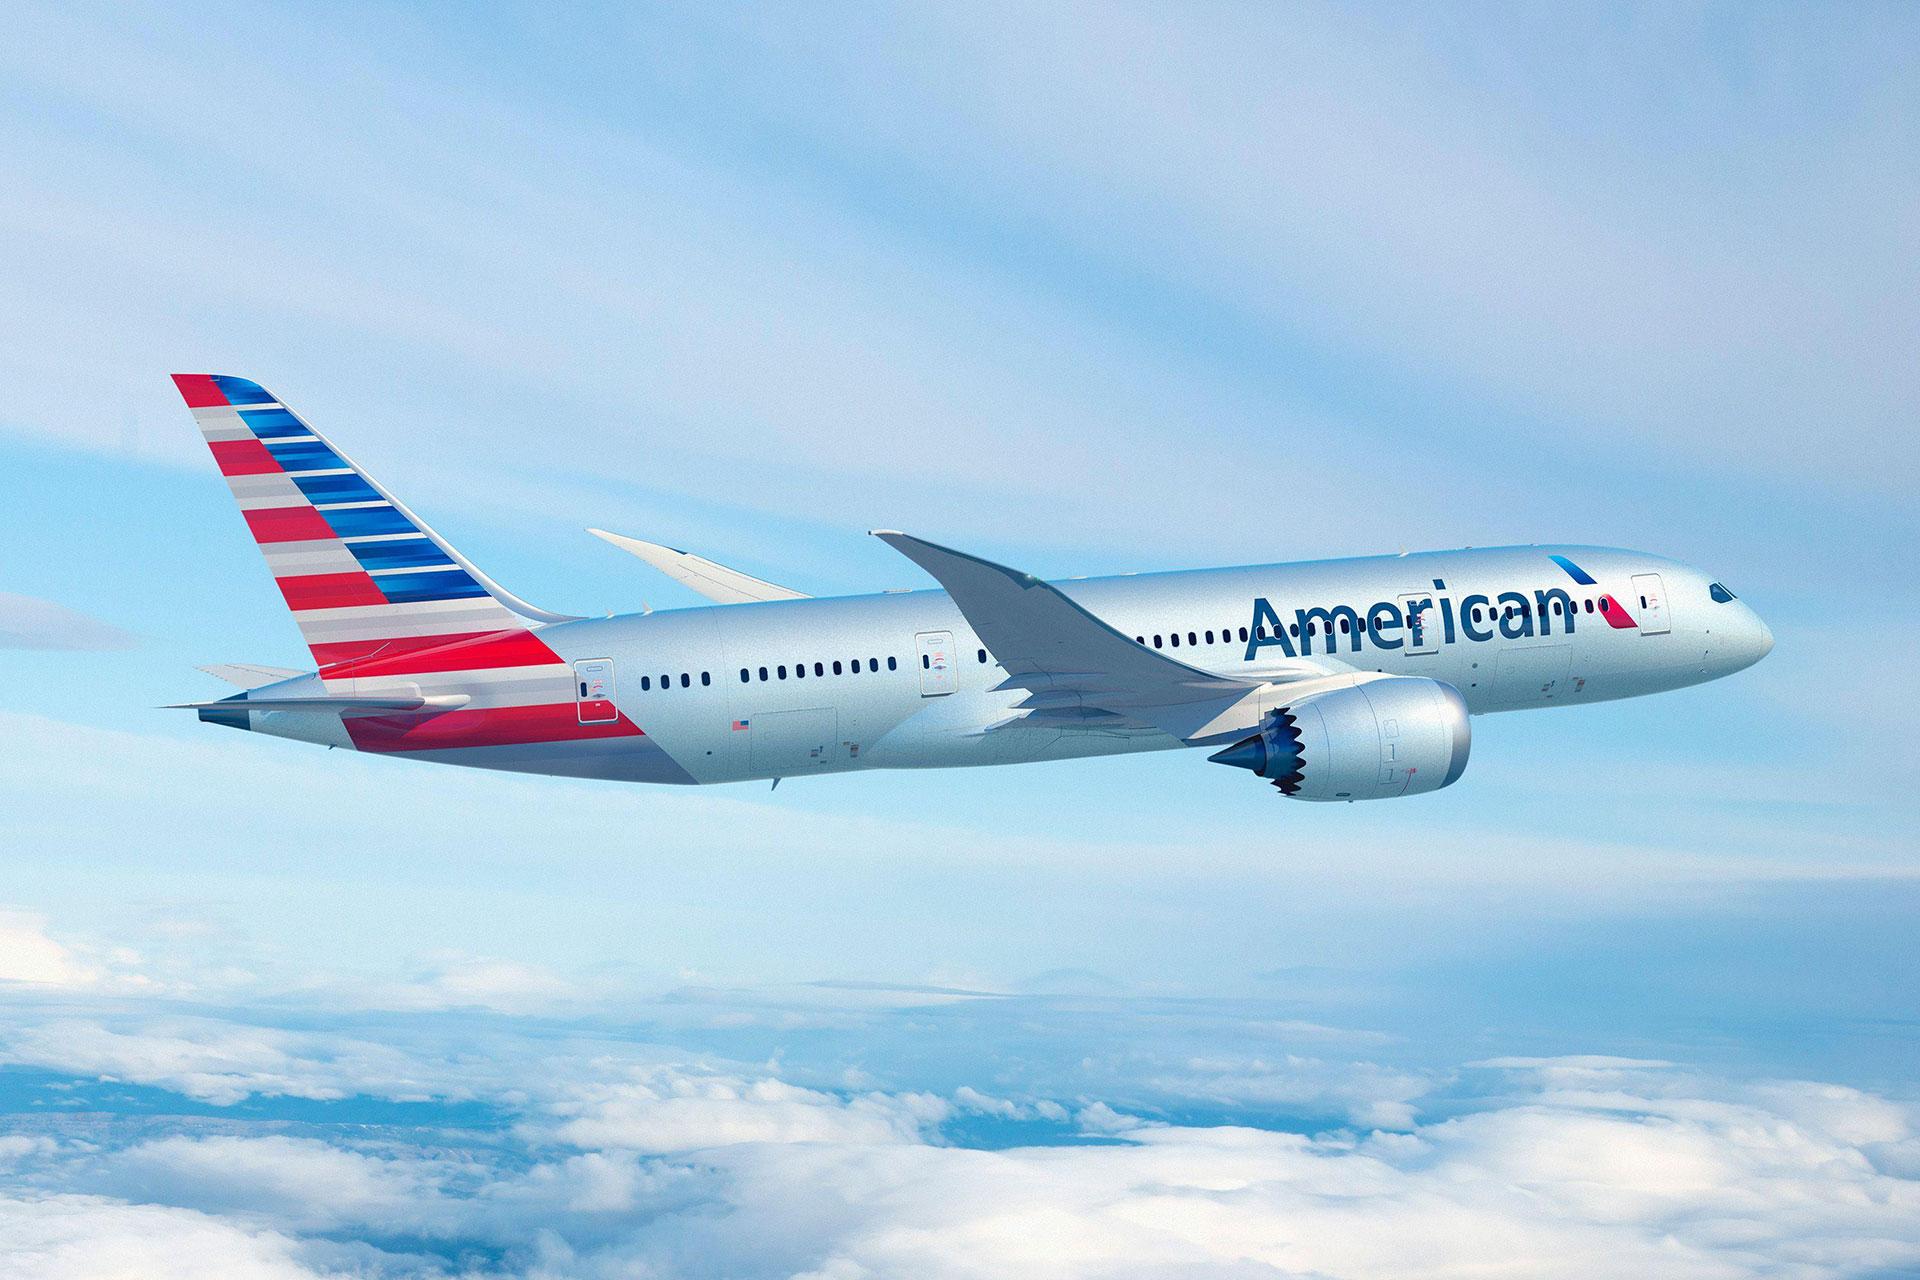 American Airlines Flight tracker